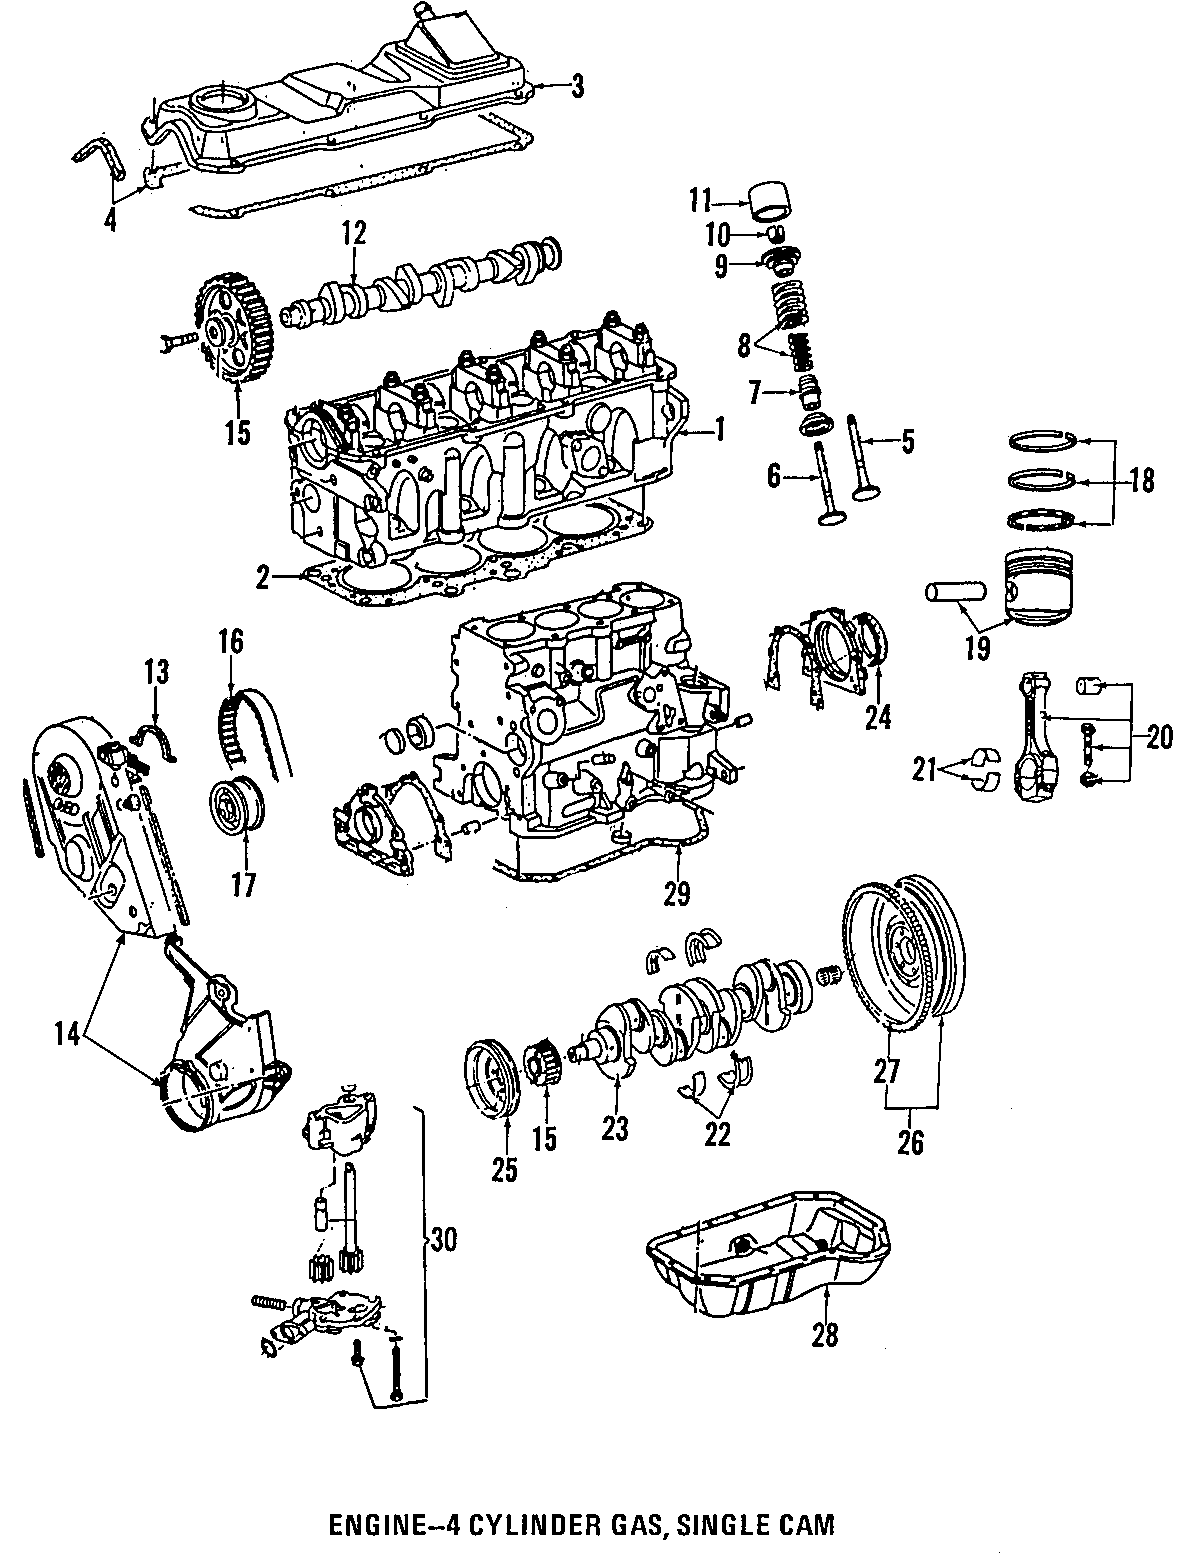 Volkswagen Golf Engine Short Block Shorteng Includes